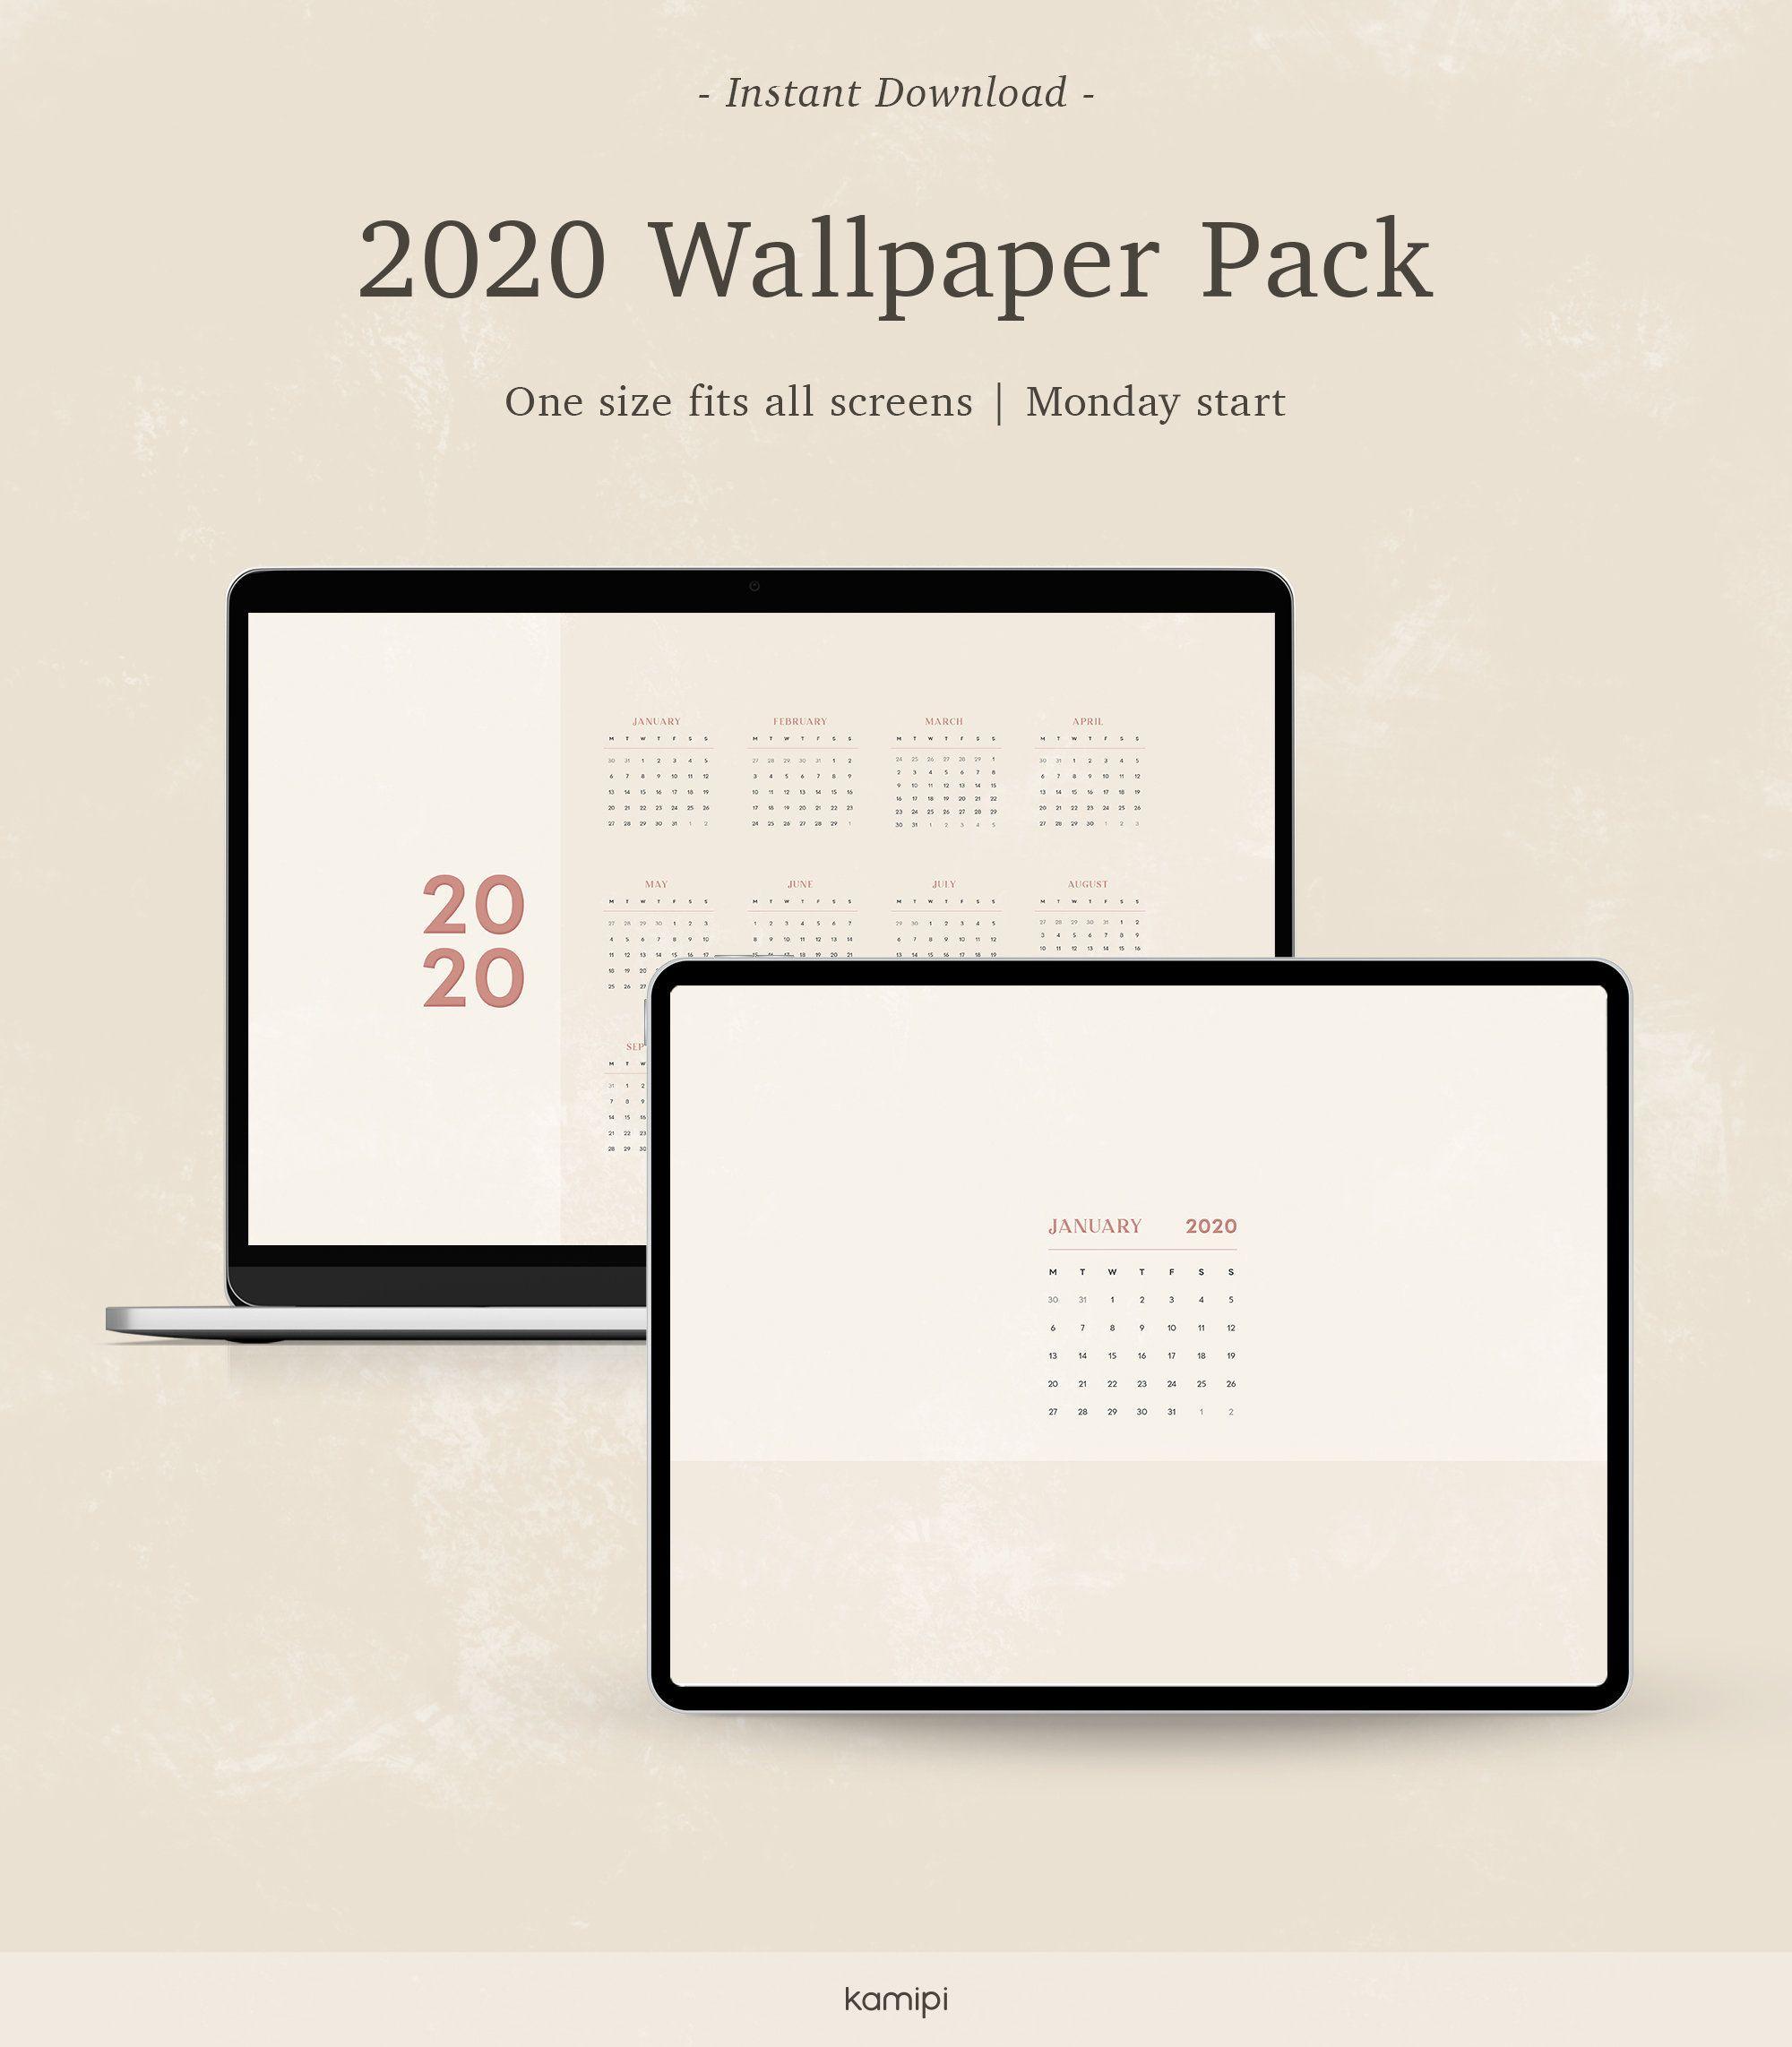 2020 Monthly Calendar Desktop Wallpaper Background Minimalist Neutral Calendar Wallpaper Instant Download In 2020 Desktop Wallpapers Backgrounds Desktop Wallpaper Calendar Calendar Wallpaper